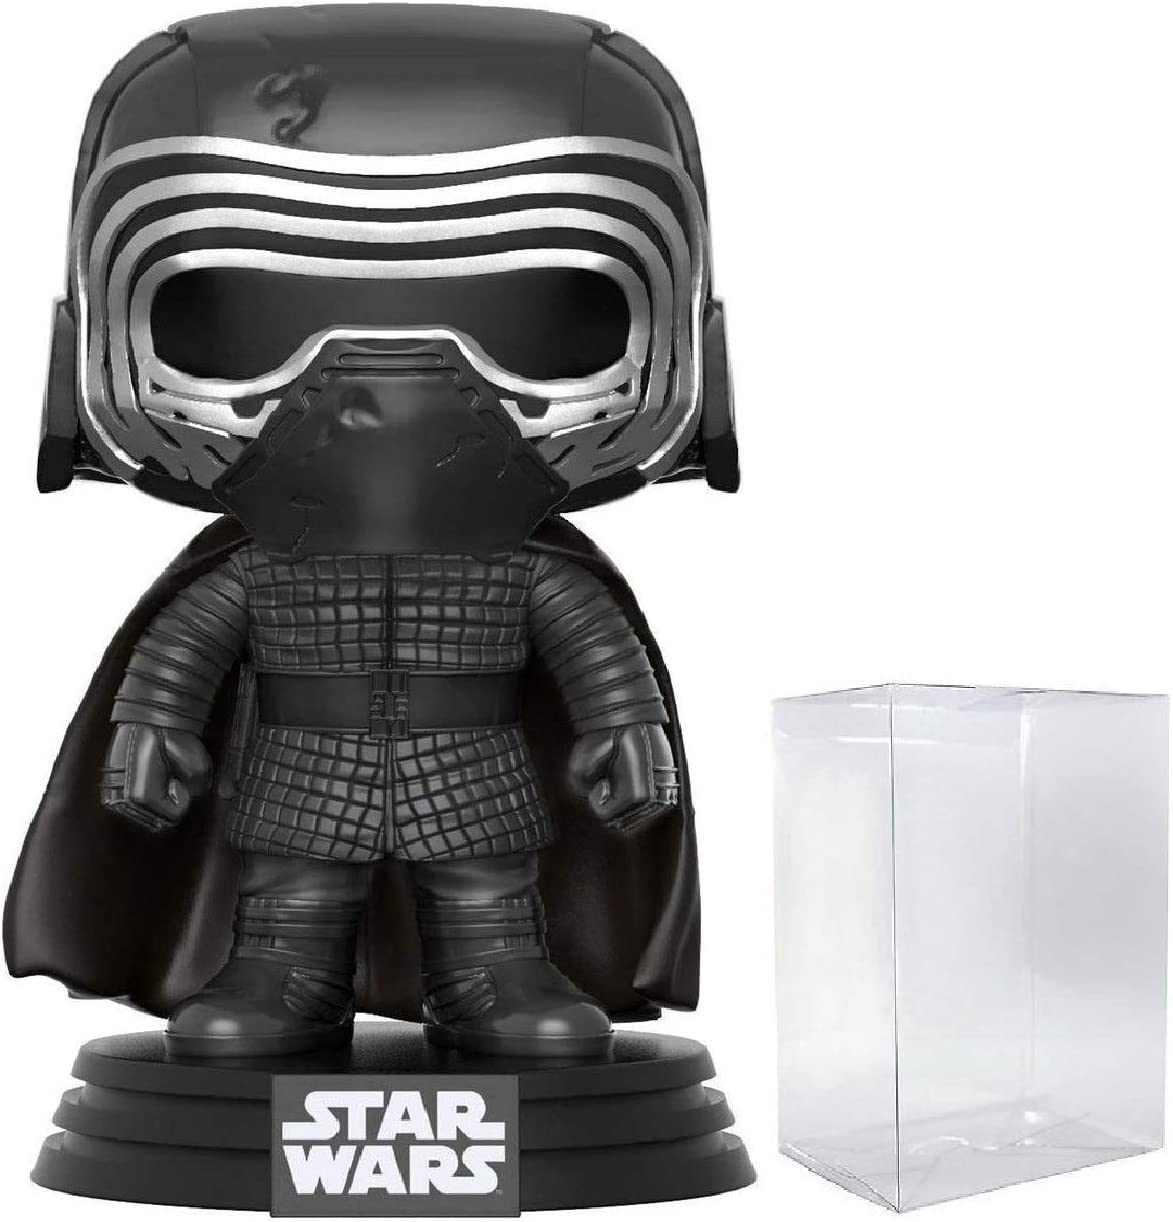 Funko Pop Star Wars: The Last Jedi - Masked Kylo Ren Vinyl Figure (Includes Compatible Pop Box Protector Case)